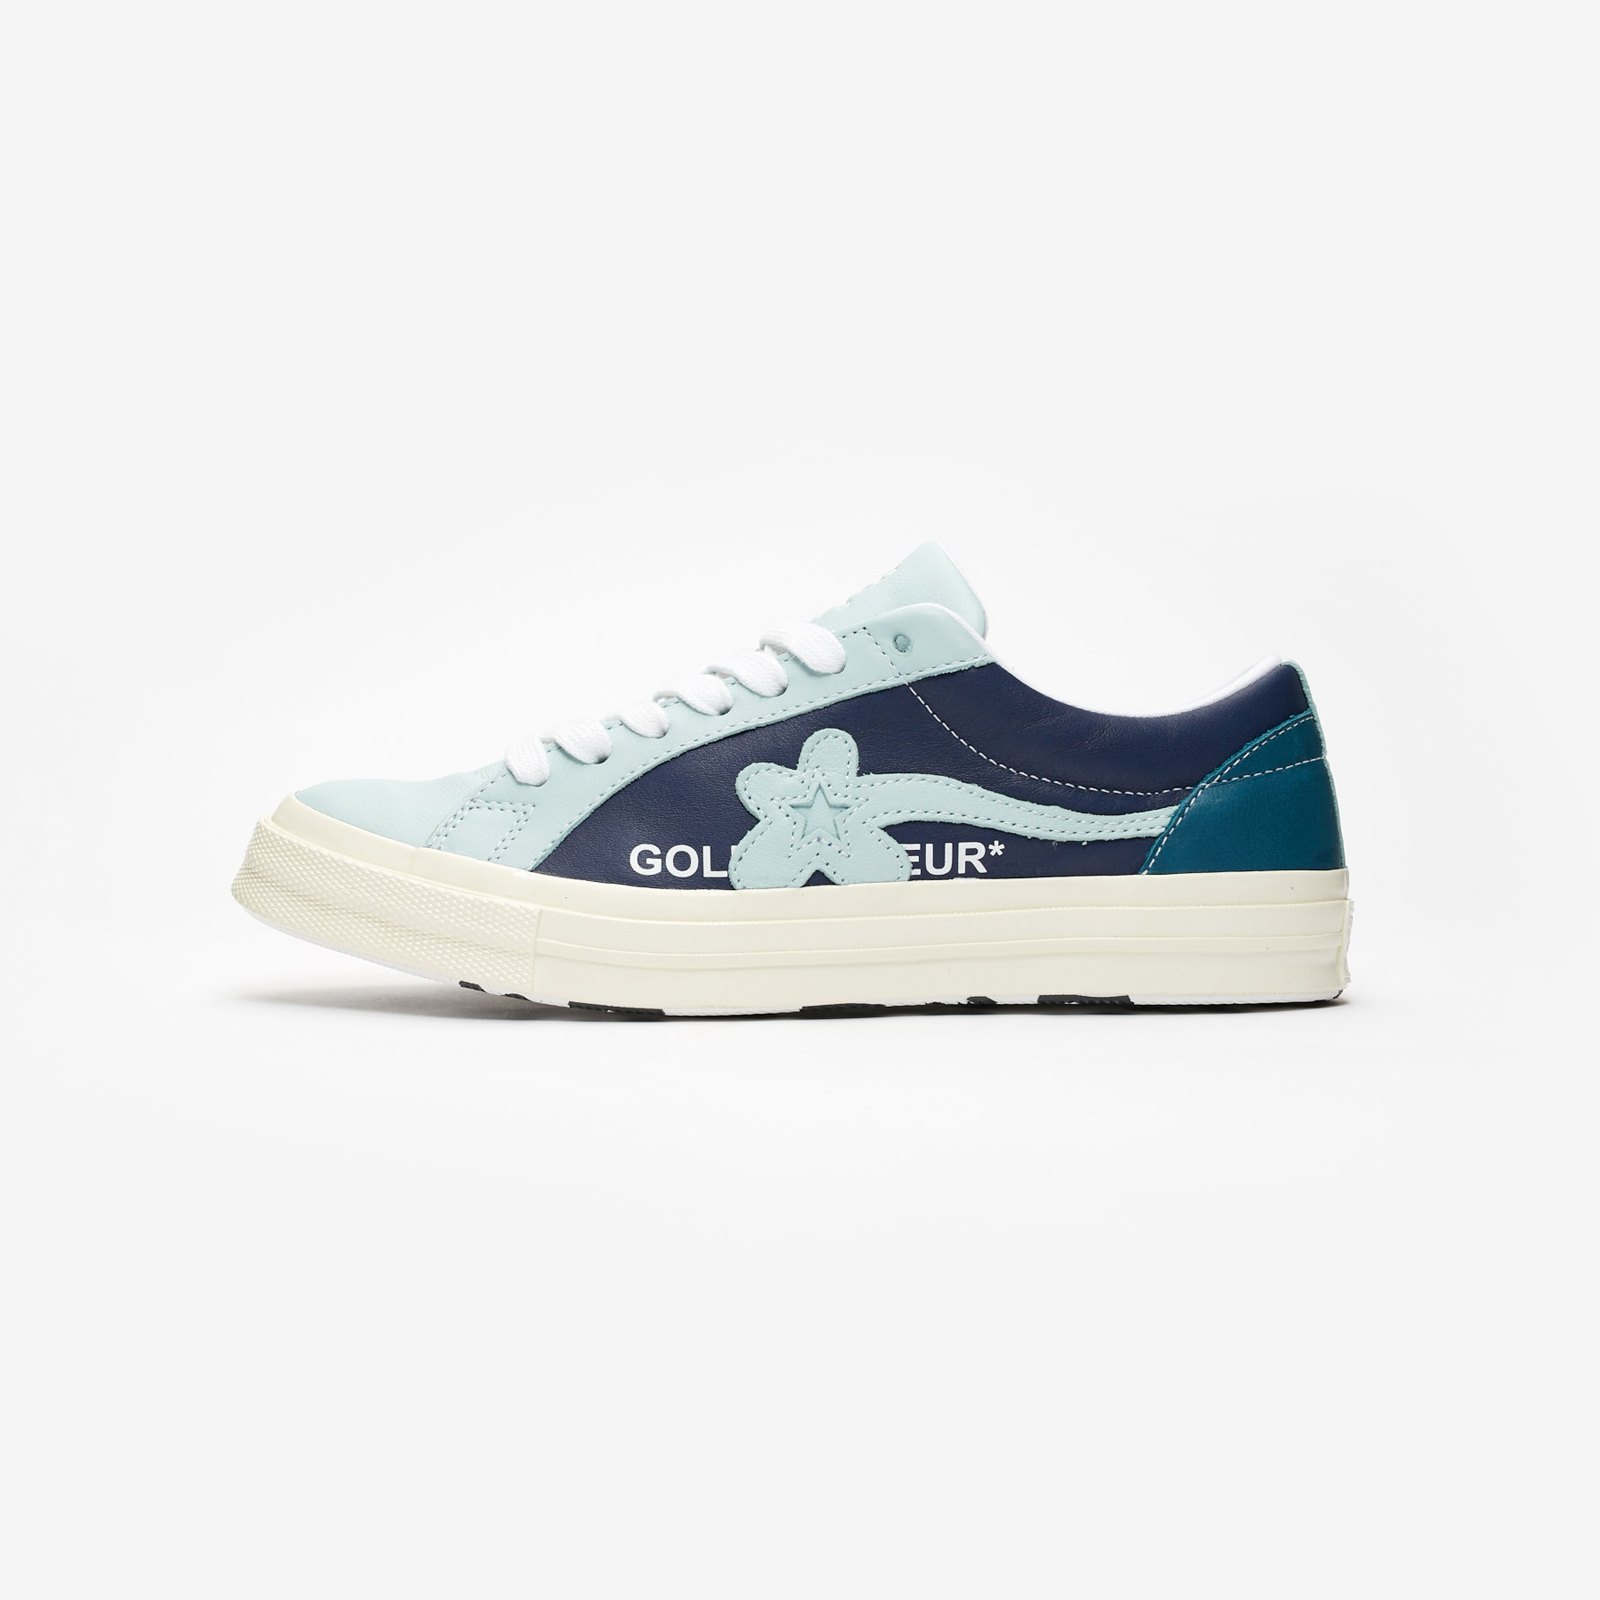 bbd2129791b Converse One Star x Golf le Fleur - 164024c - Sneakersnstuff ...